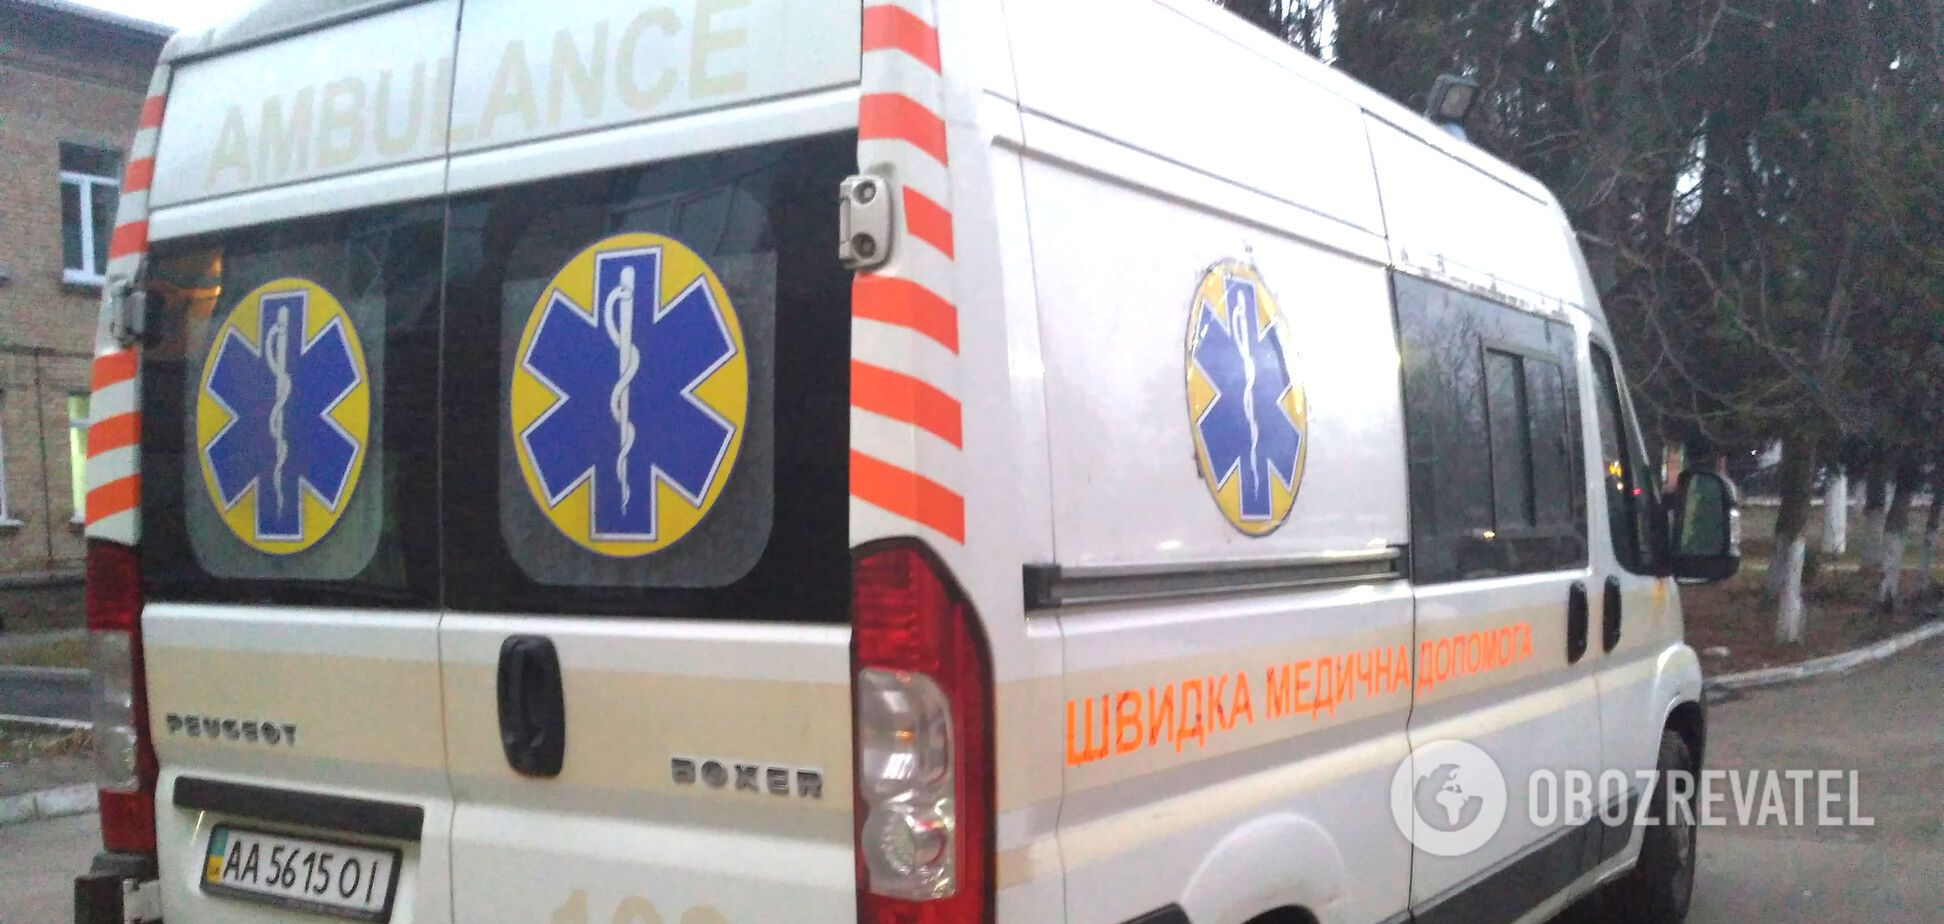 Криминал Киев